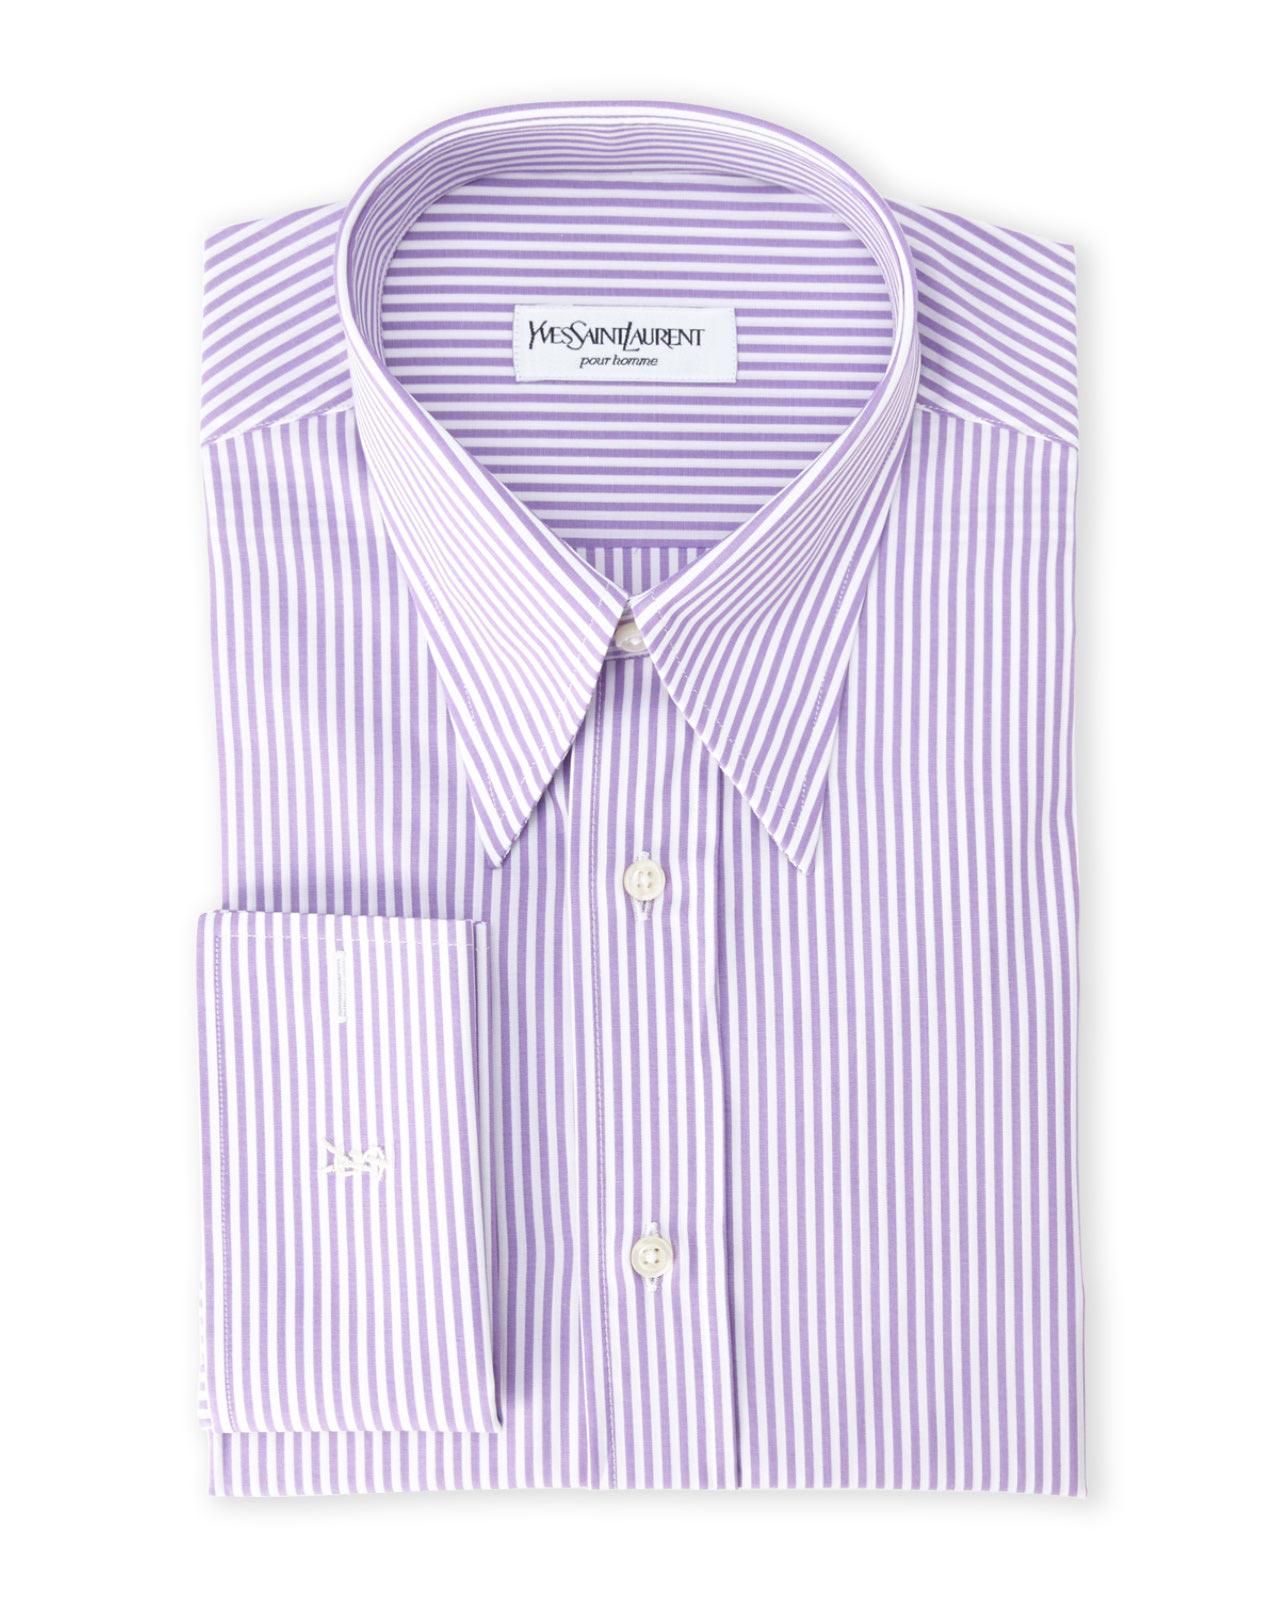 Lyst saint laurent purple stripe french cuff dress shirt for Purple french cuff dress shirt